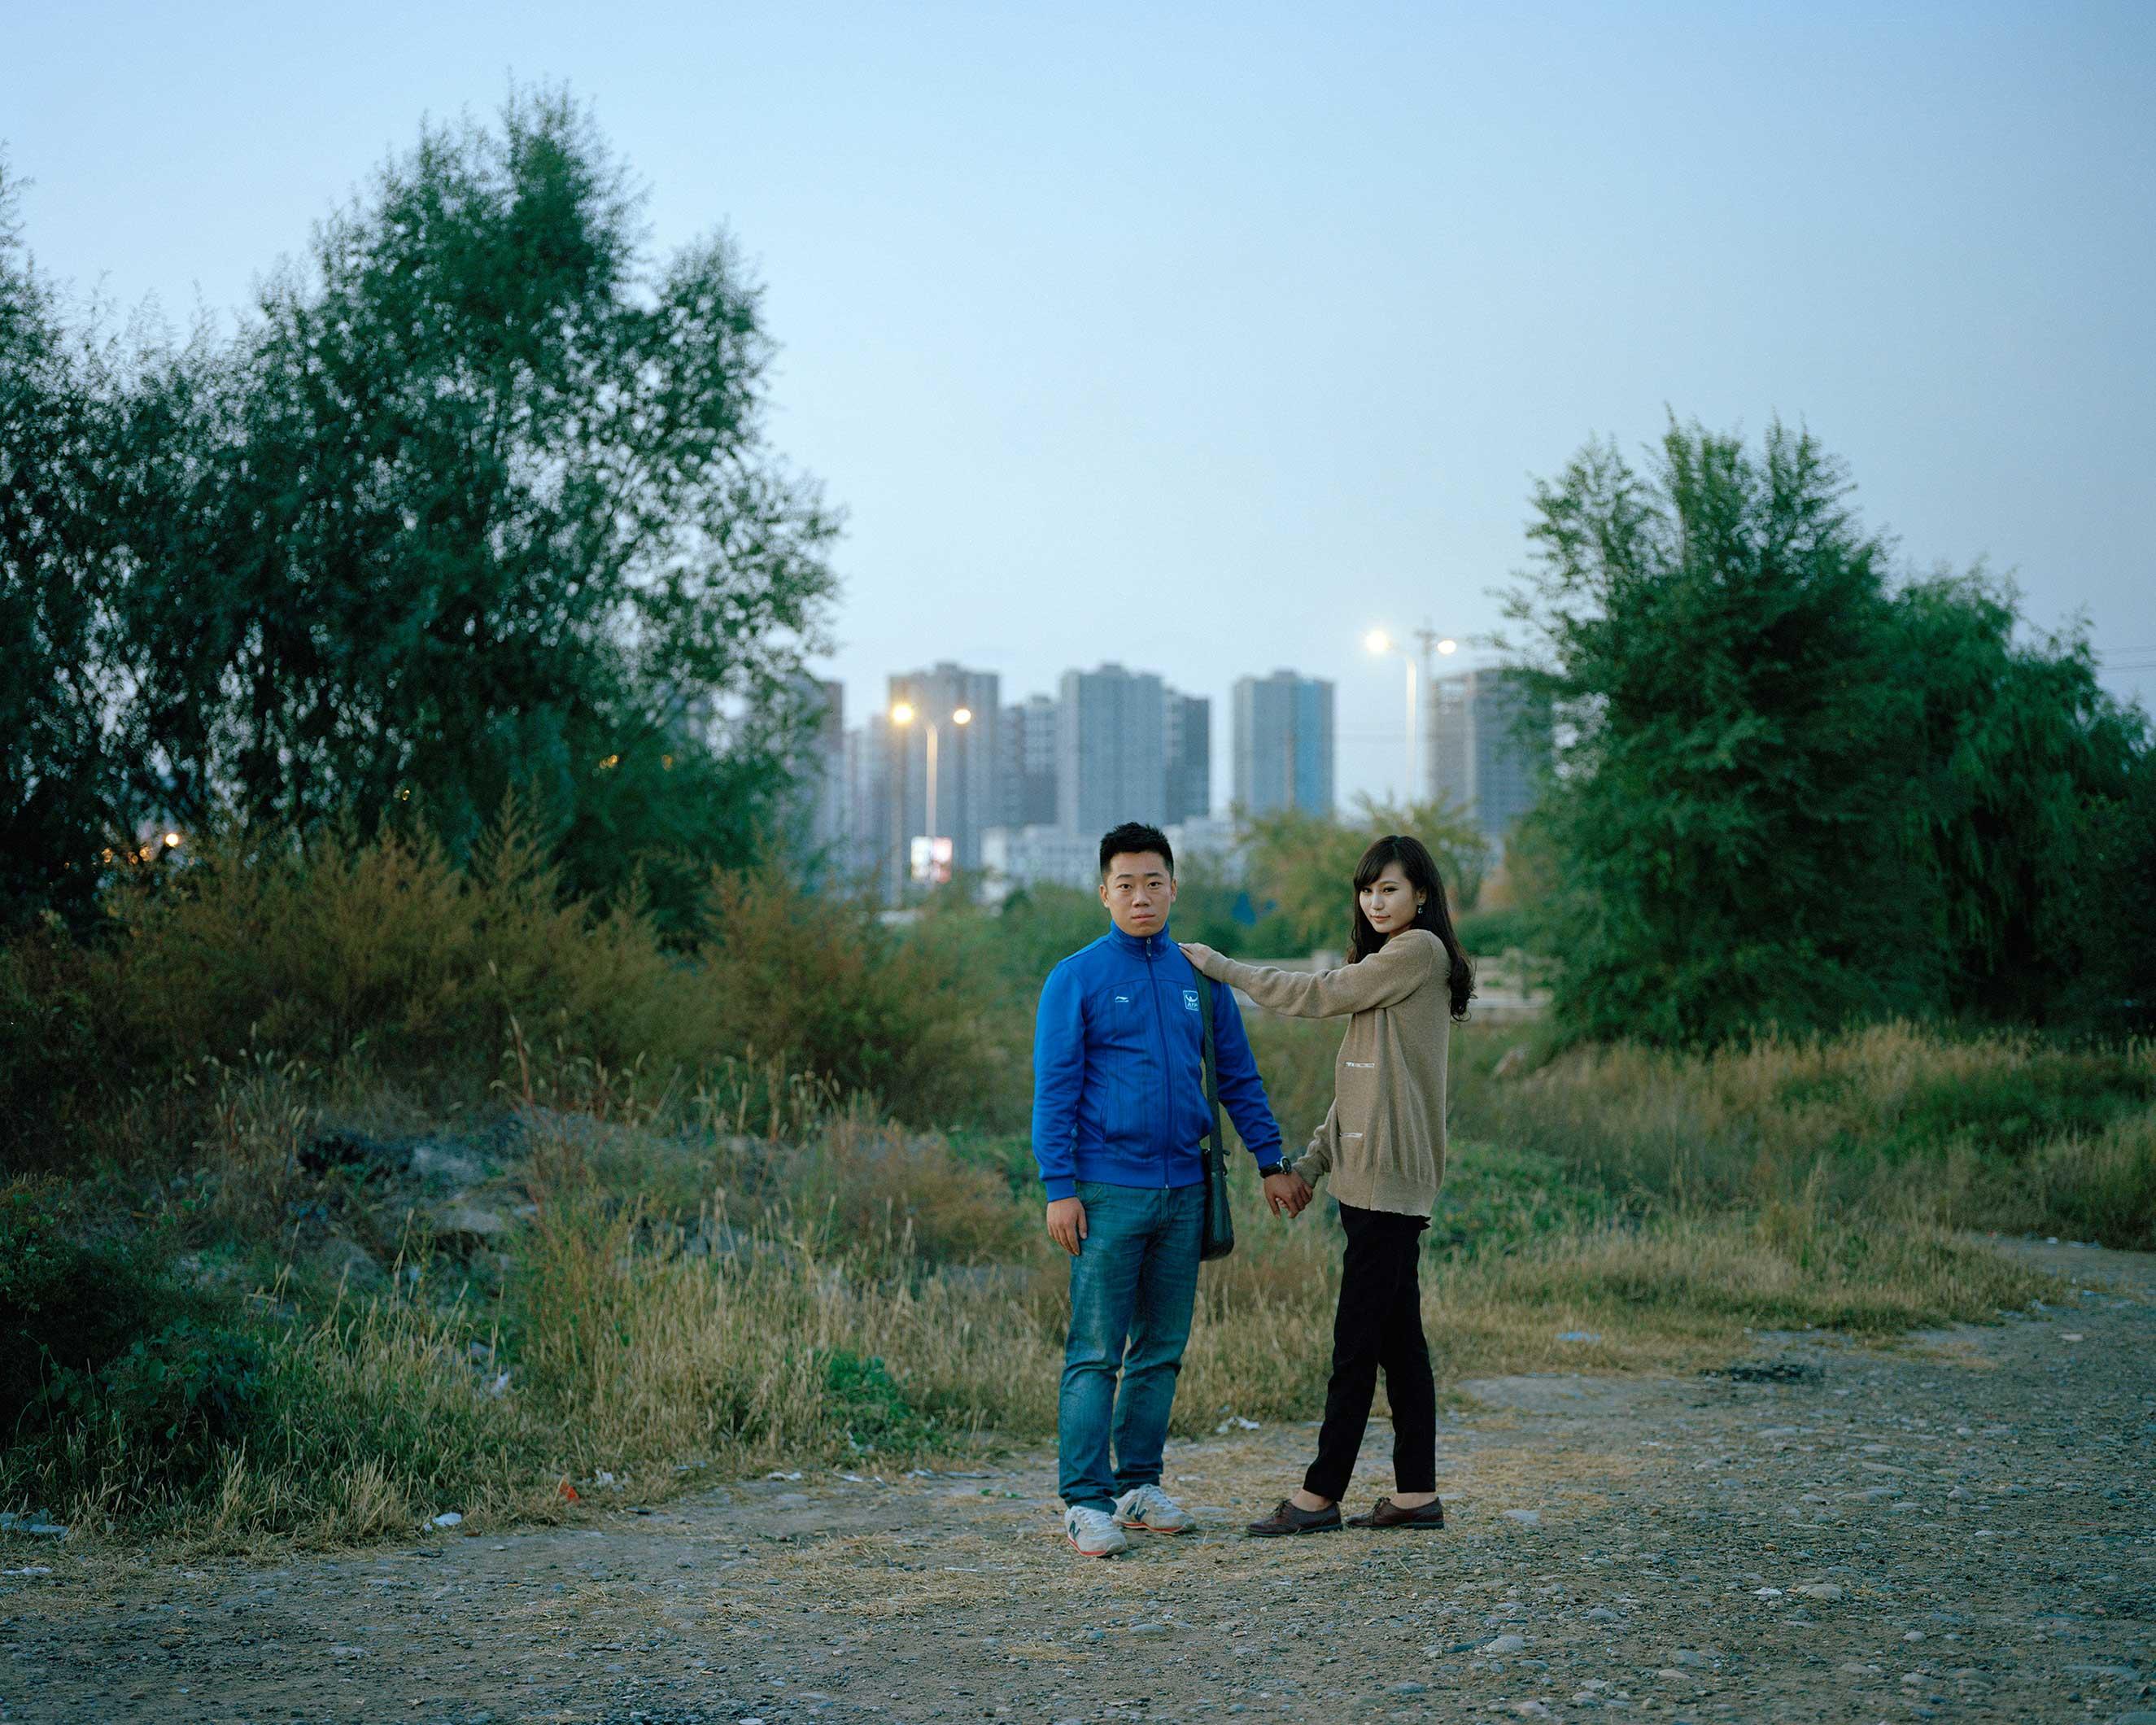 Lanzhou, Gansu Province, China, October 2013. Hu Xiao and his girlfriend Lan Xiaomei, both 23 years old, by the Yellow river.